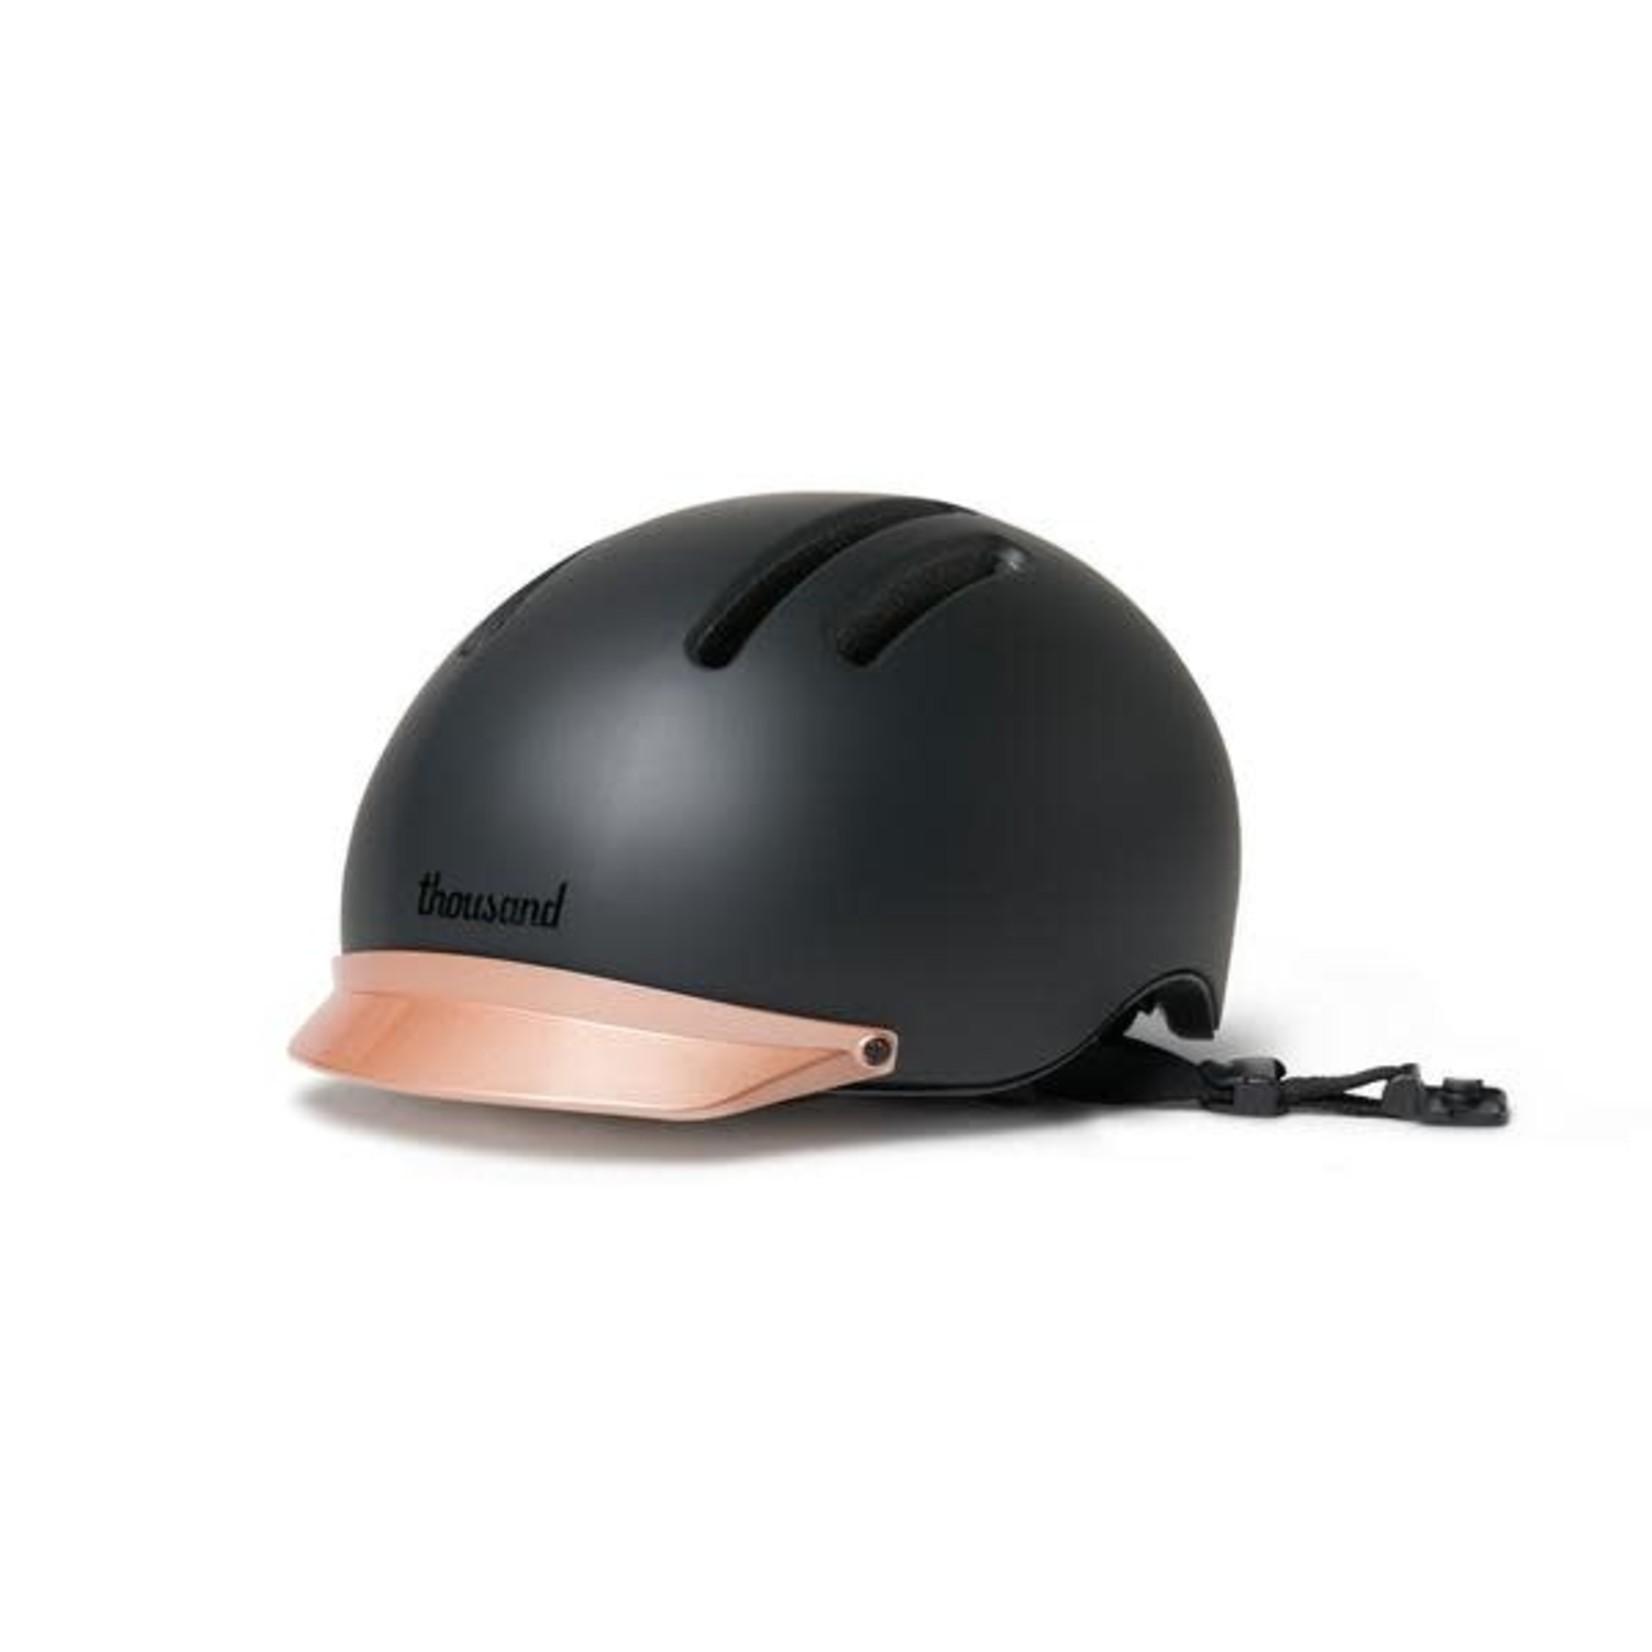 Thousand Thousand Chapter Helmet Visor